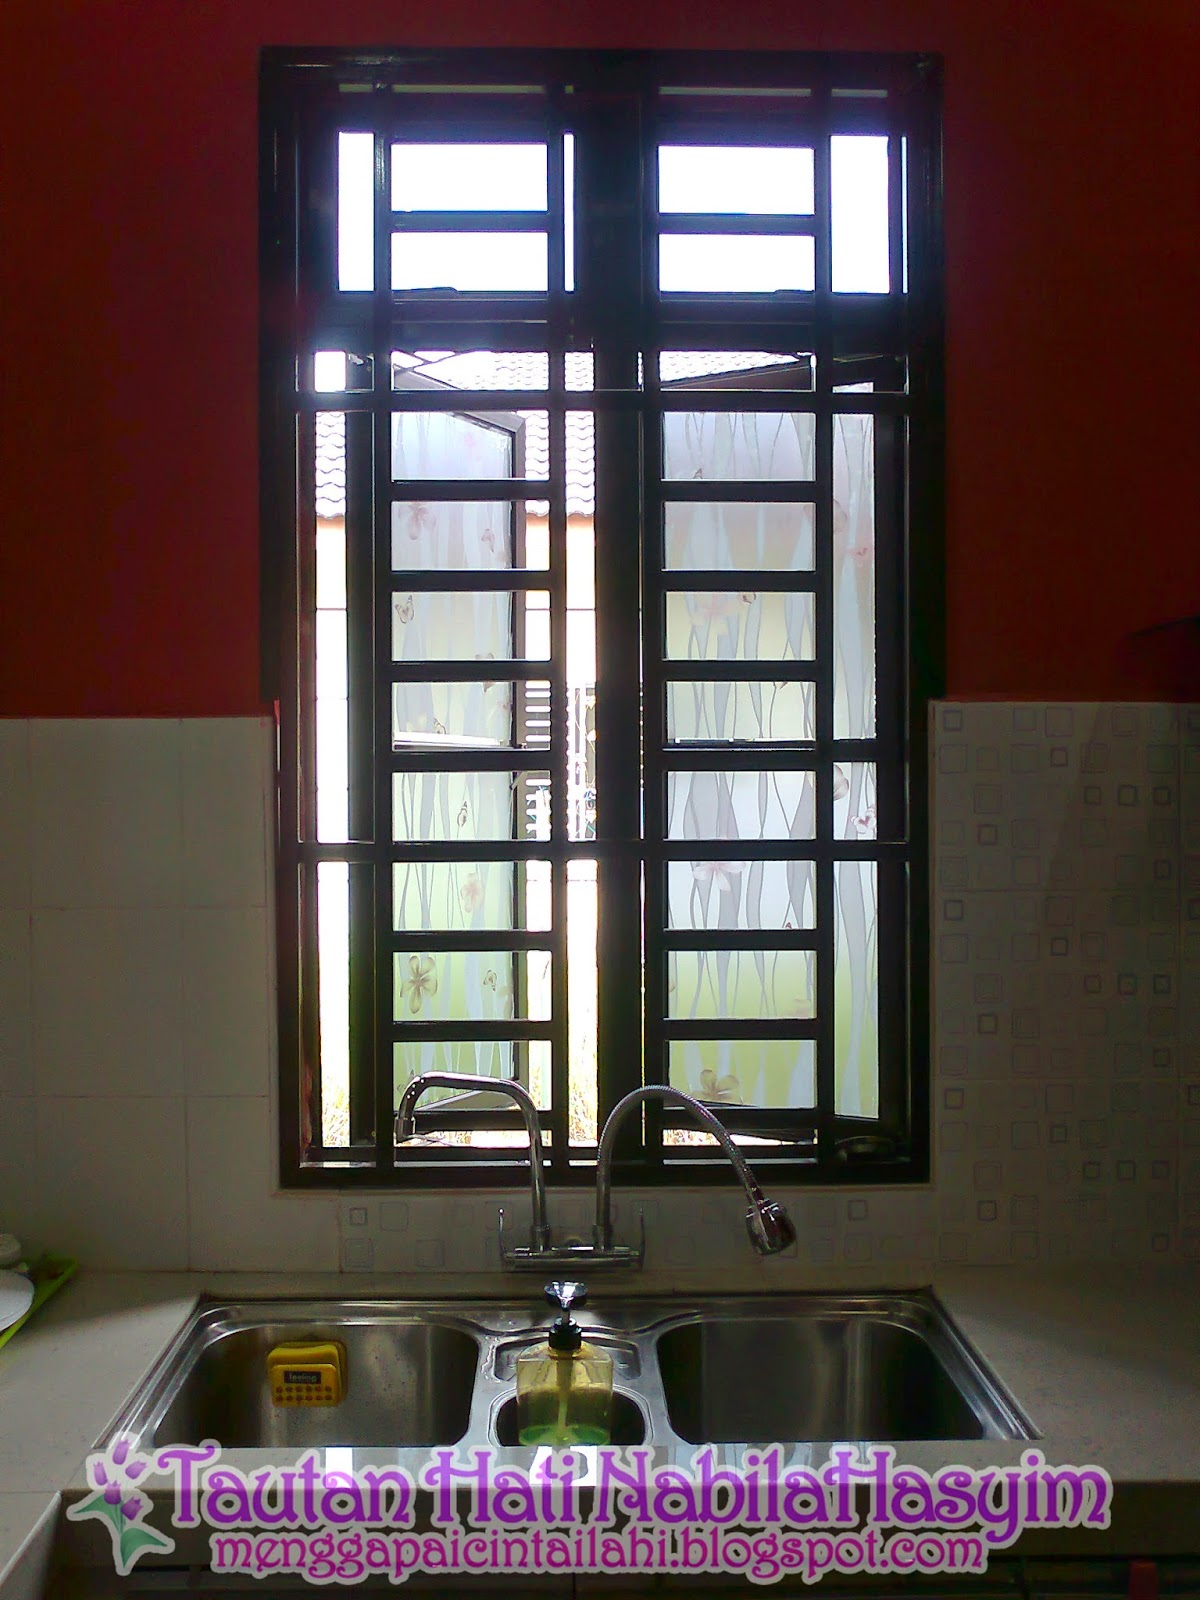 Memandangkan Tuan Rumah Cabaran Susun Atur Sioca Up Entri Pasal Sinki Di Kabinet Dapur Saya Pun Nak Juga La Cerita Buat Sikit Ikut Bahagian